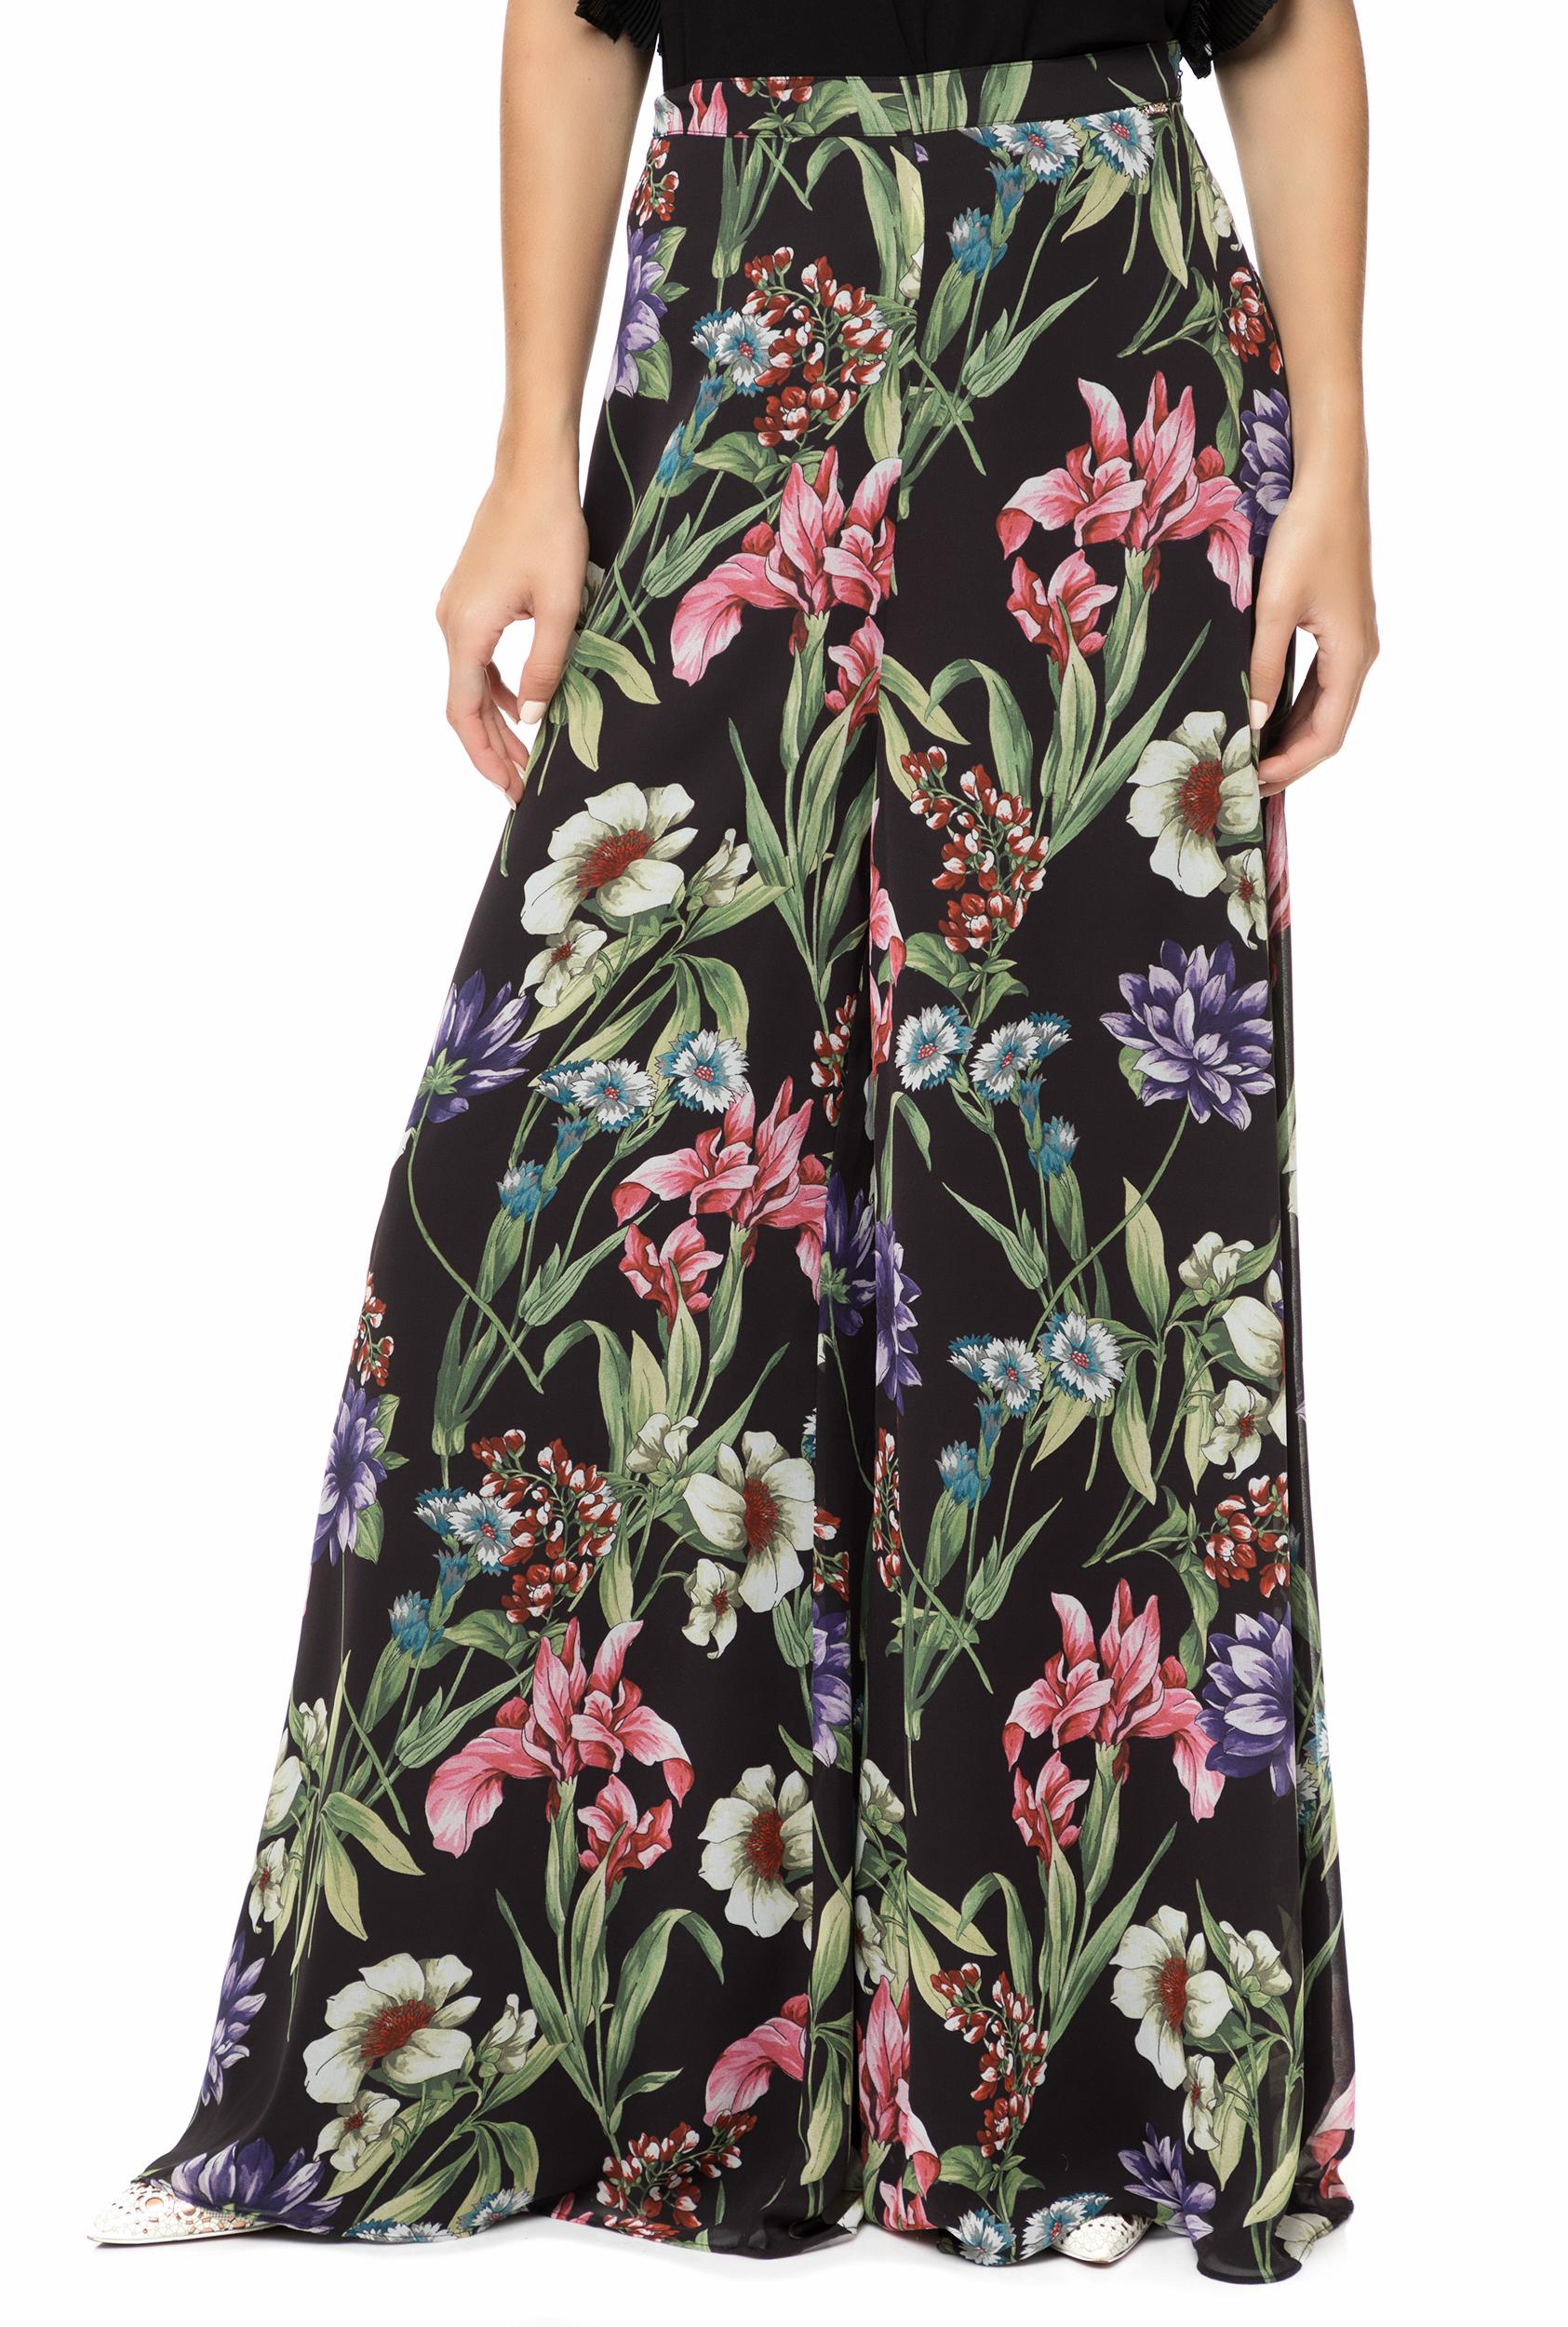 CollectiveOnline GUESS - Γυναικεία ψηλόμεση παντελόνα GUESS RAMONA μαύρο με  φλοράλ fa08854070d